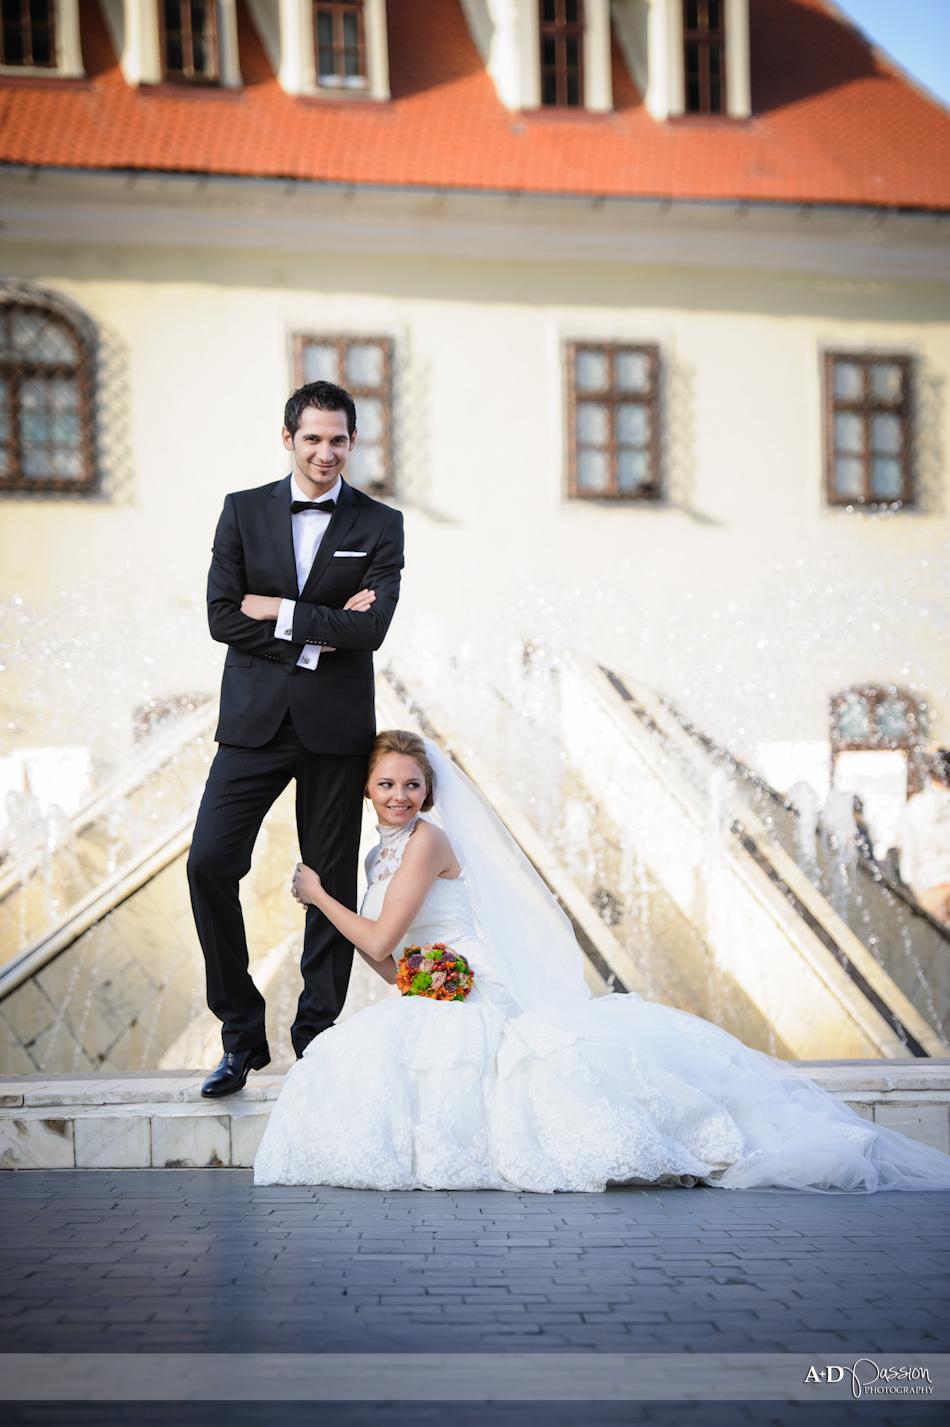 AD Passion Photography | ad-passion_fotograf-profesionist-nunta_poiana-brasov_after-wedding_trash-the-dress_nunta-brasov_fine-art-photography_iusti-si-antonia_0077 | Adelin, Dida, fotograf profesionist, fotograf de nunta, fotografie de nunta, fotograf Timisoara, fotograf Craiova, fotograf Bucuresti, fotograf Arad, nunta Timisoara, nunta Arad, nunta Bucuresti, nunta Craiova